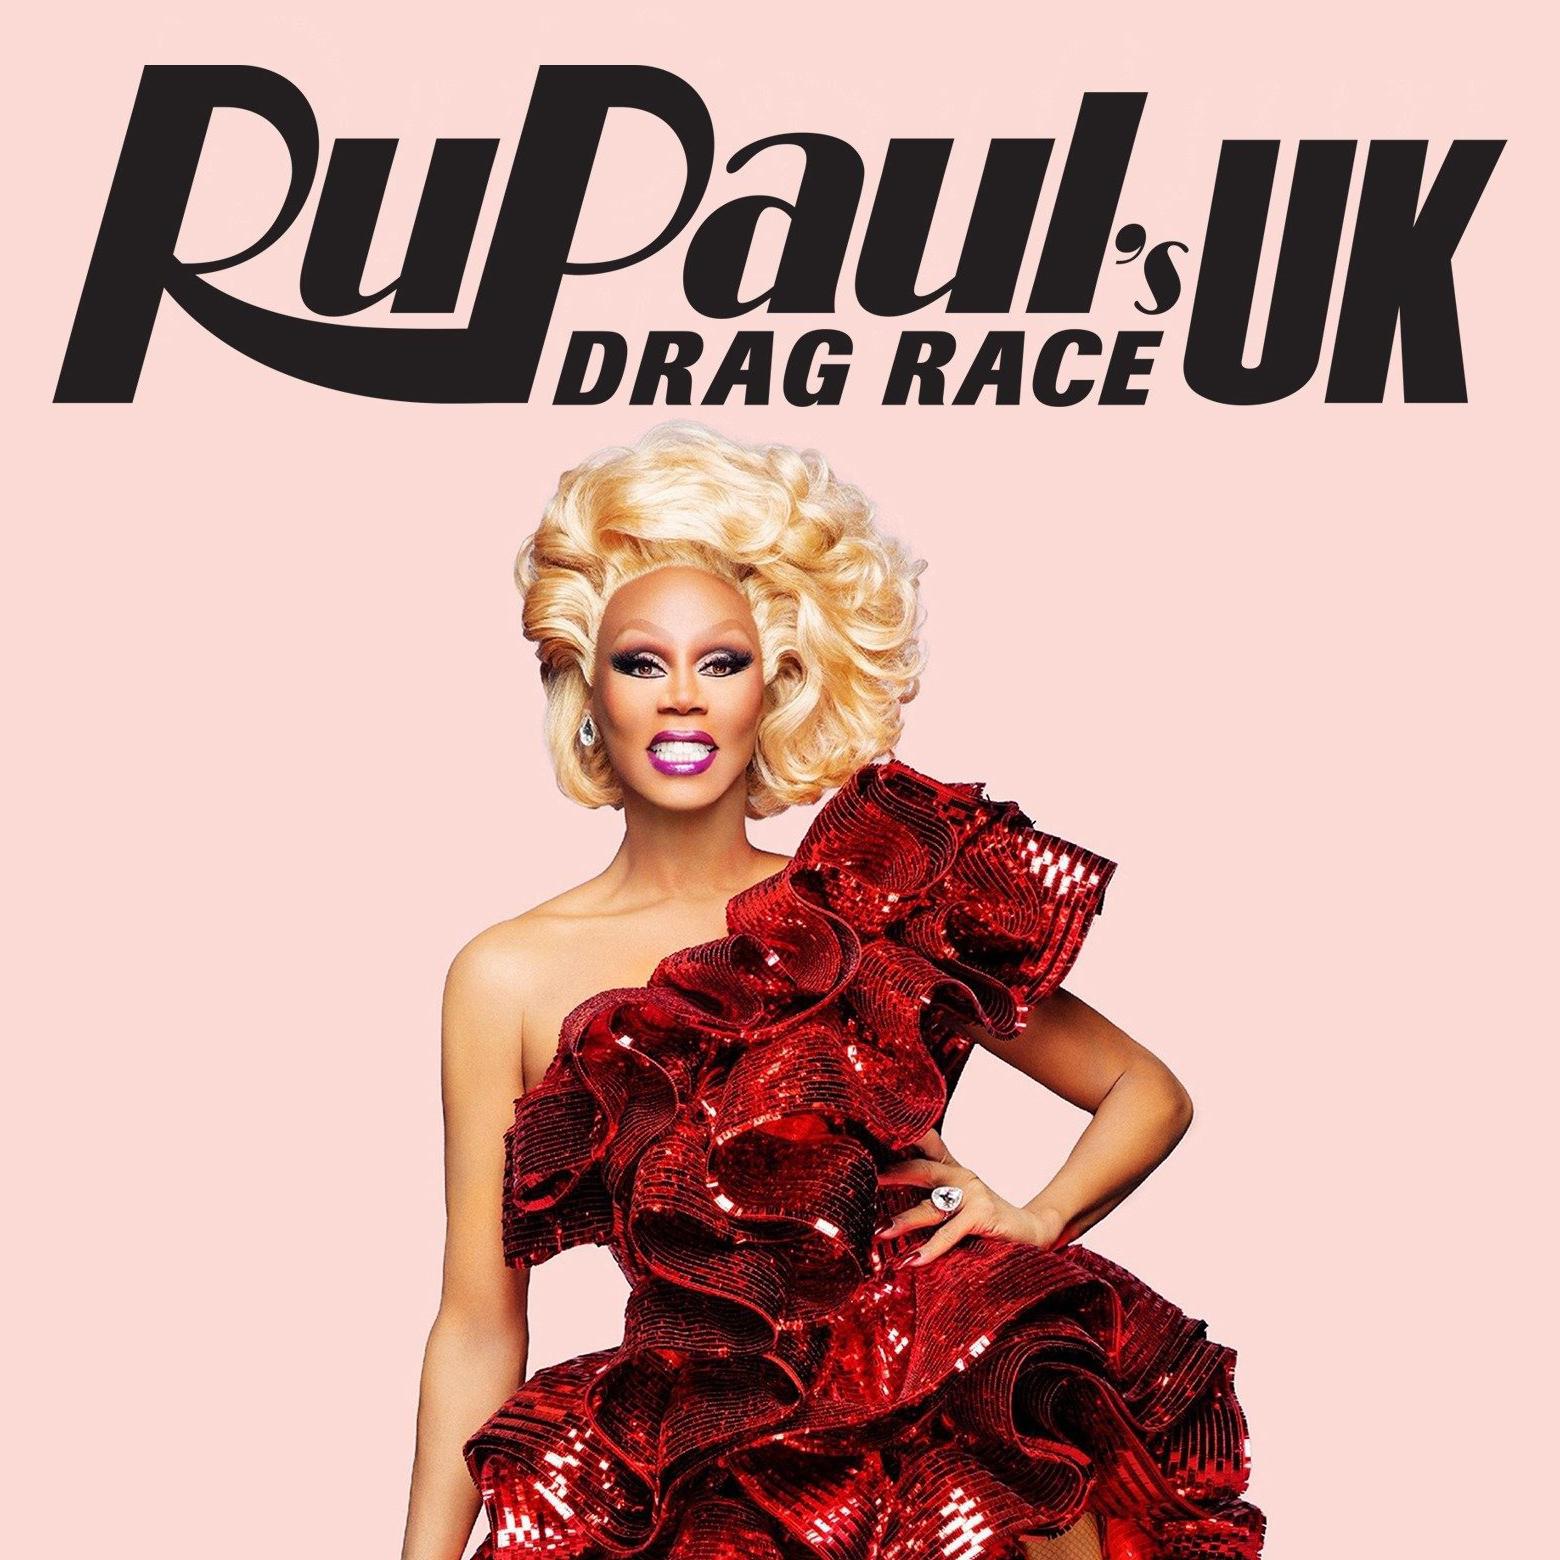 Rupaul S Drag Race Uk Season 1 Rupaul S Drag Race Wiki Fandom